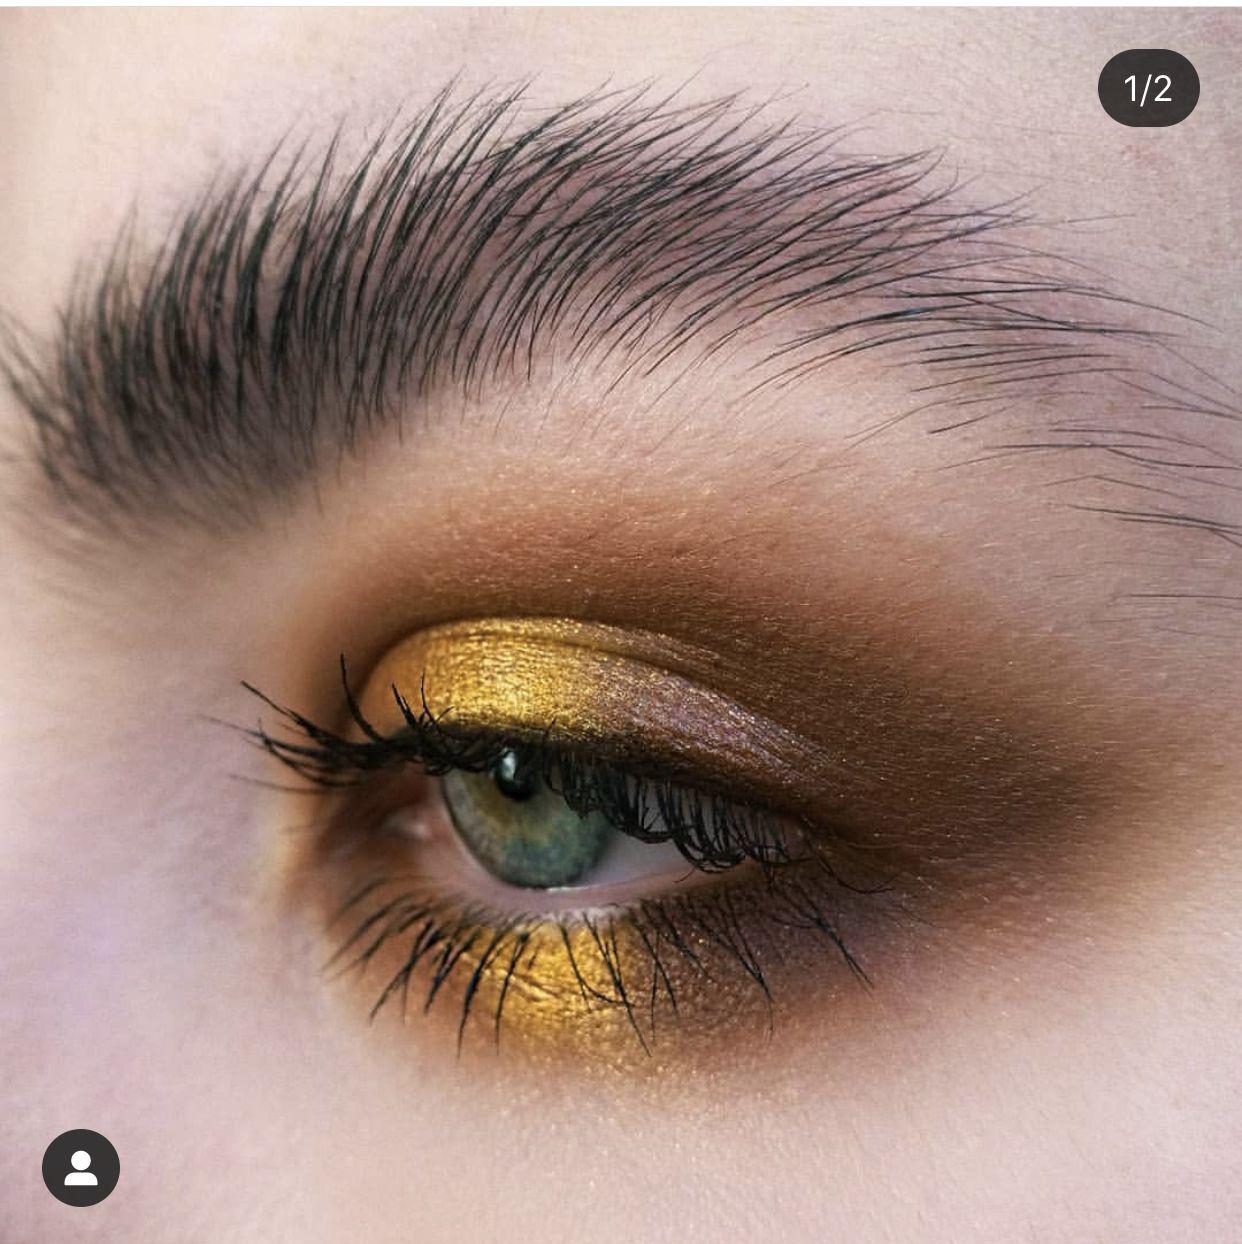 Pin by Mary Kalinina on Yellow jacket Halo eye makeup